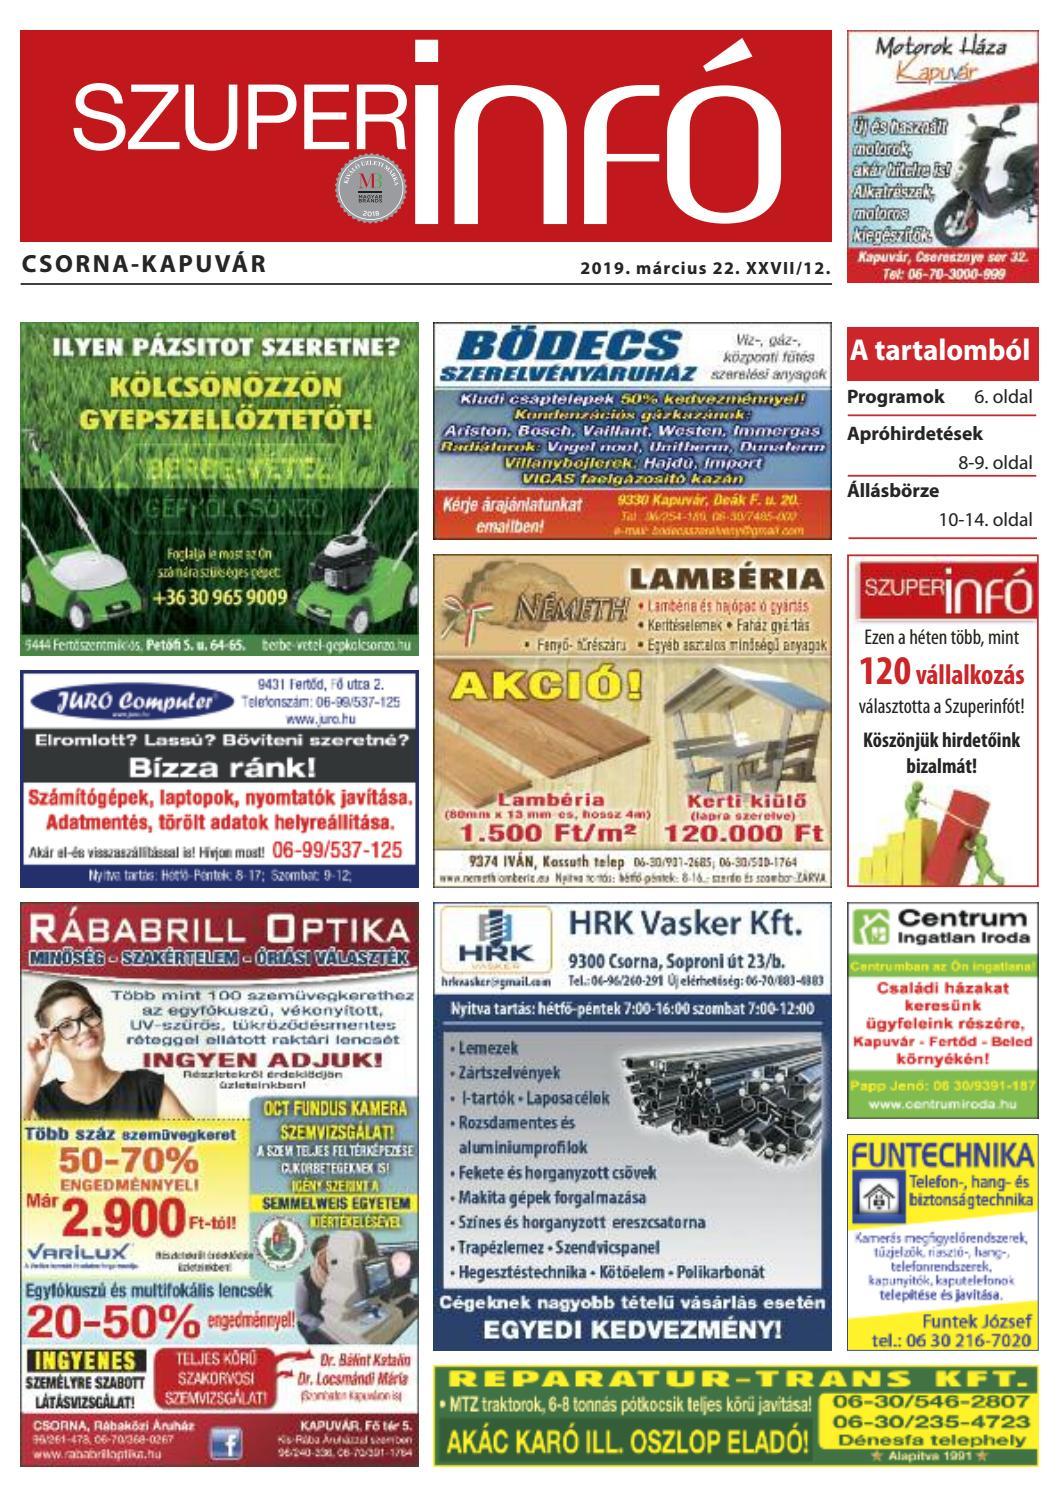 ef1a8d5609b4 Csorna-Kapuvár Szuperinfó 12. hét by Info Rbakoz - issuu